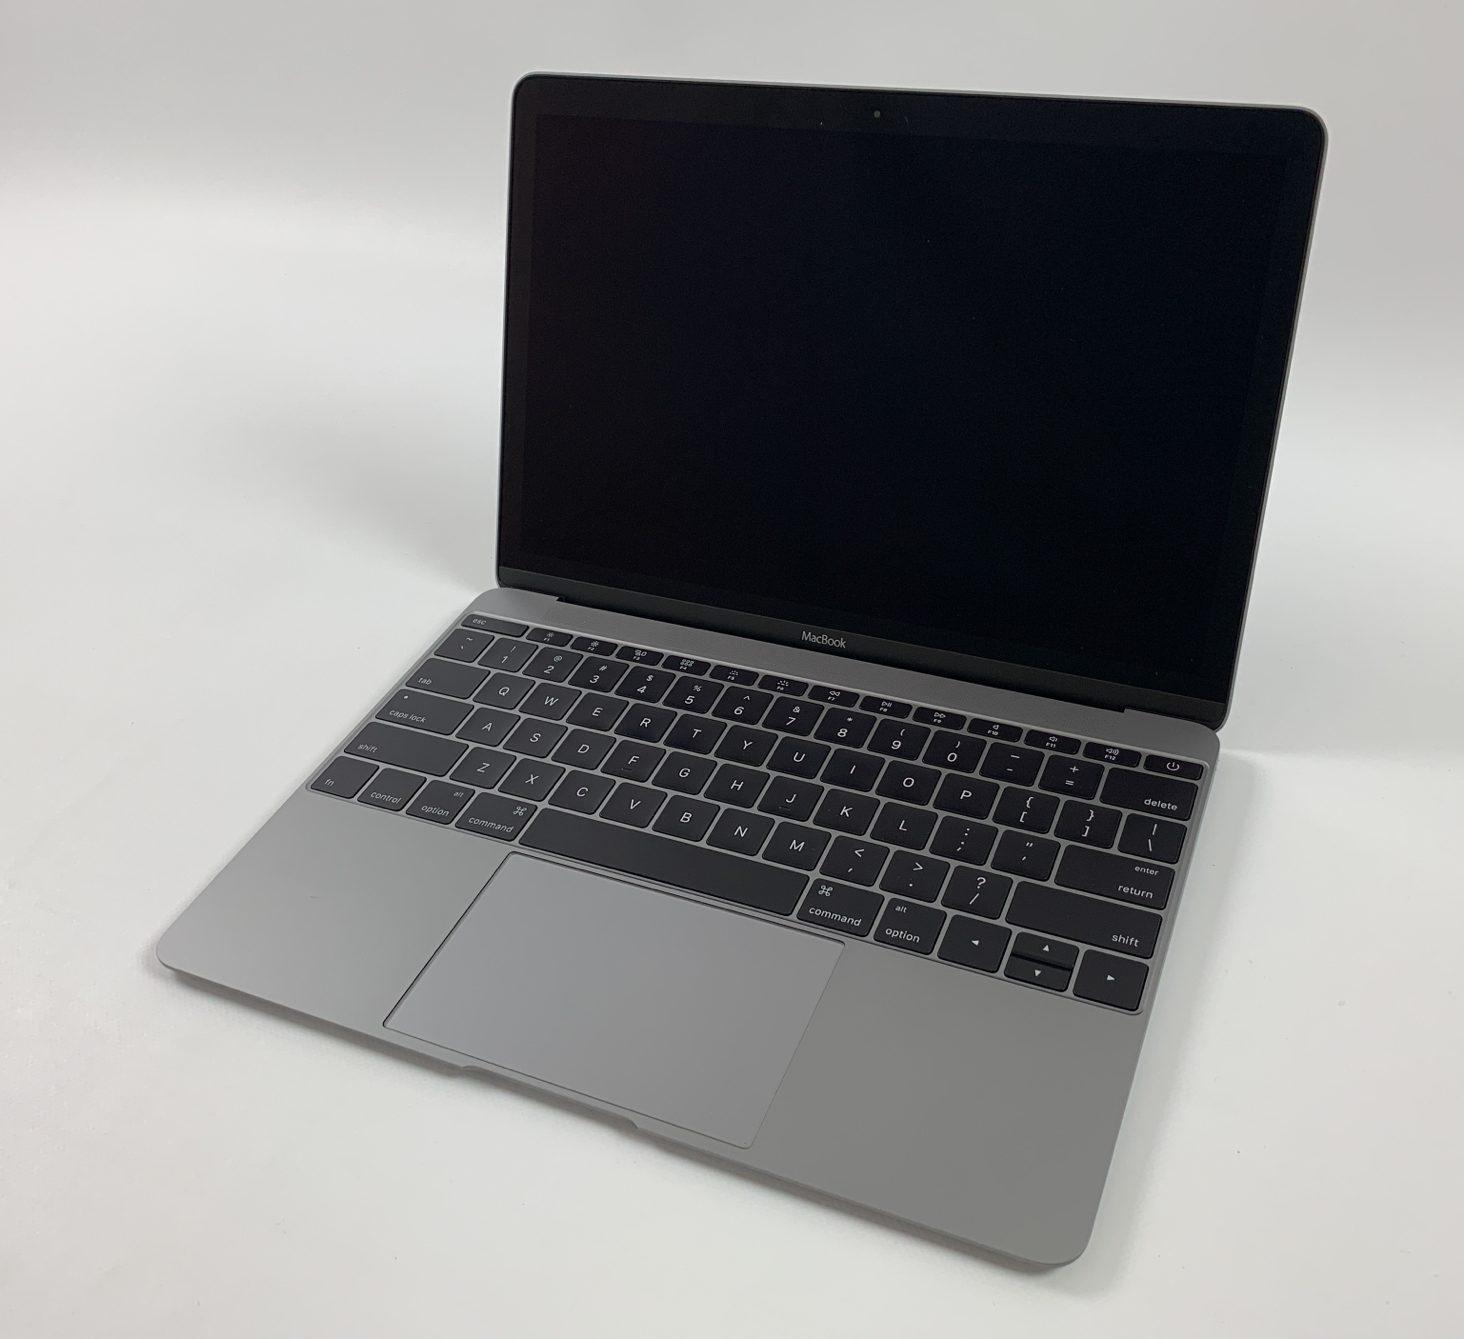 "MacBook 12"" Early 2015 (Intel Core M 1.1 GHz 8 GB RAM 256 GB SSD), Space Gray, Intel Core M 1.1 GHz, 8 GB RAM, 256 GB SSD, bild 1"